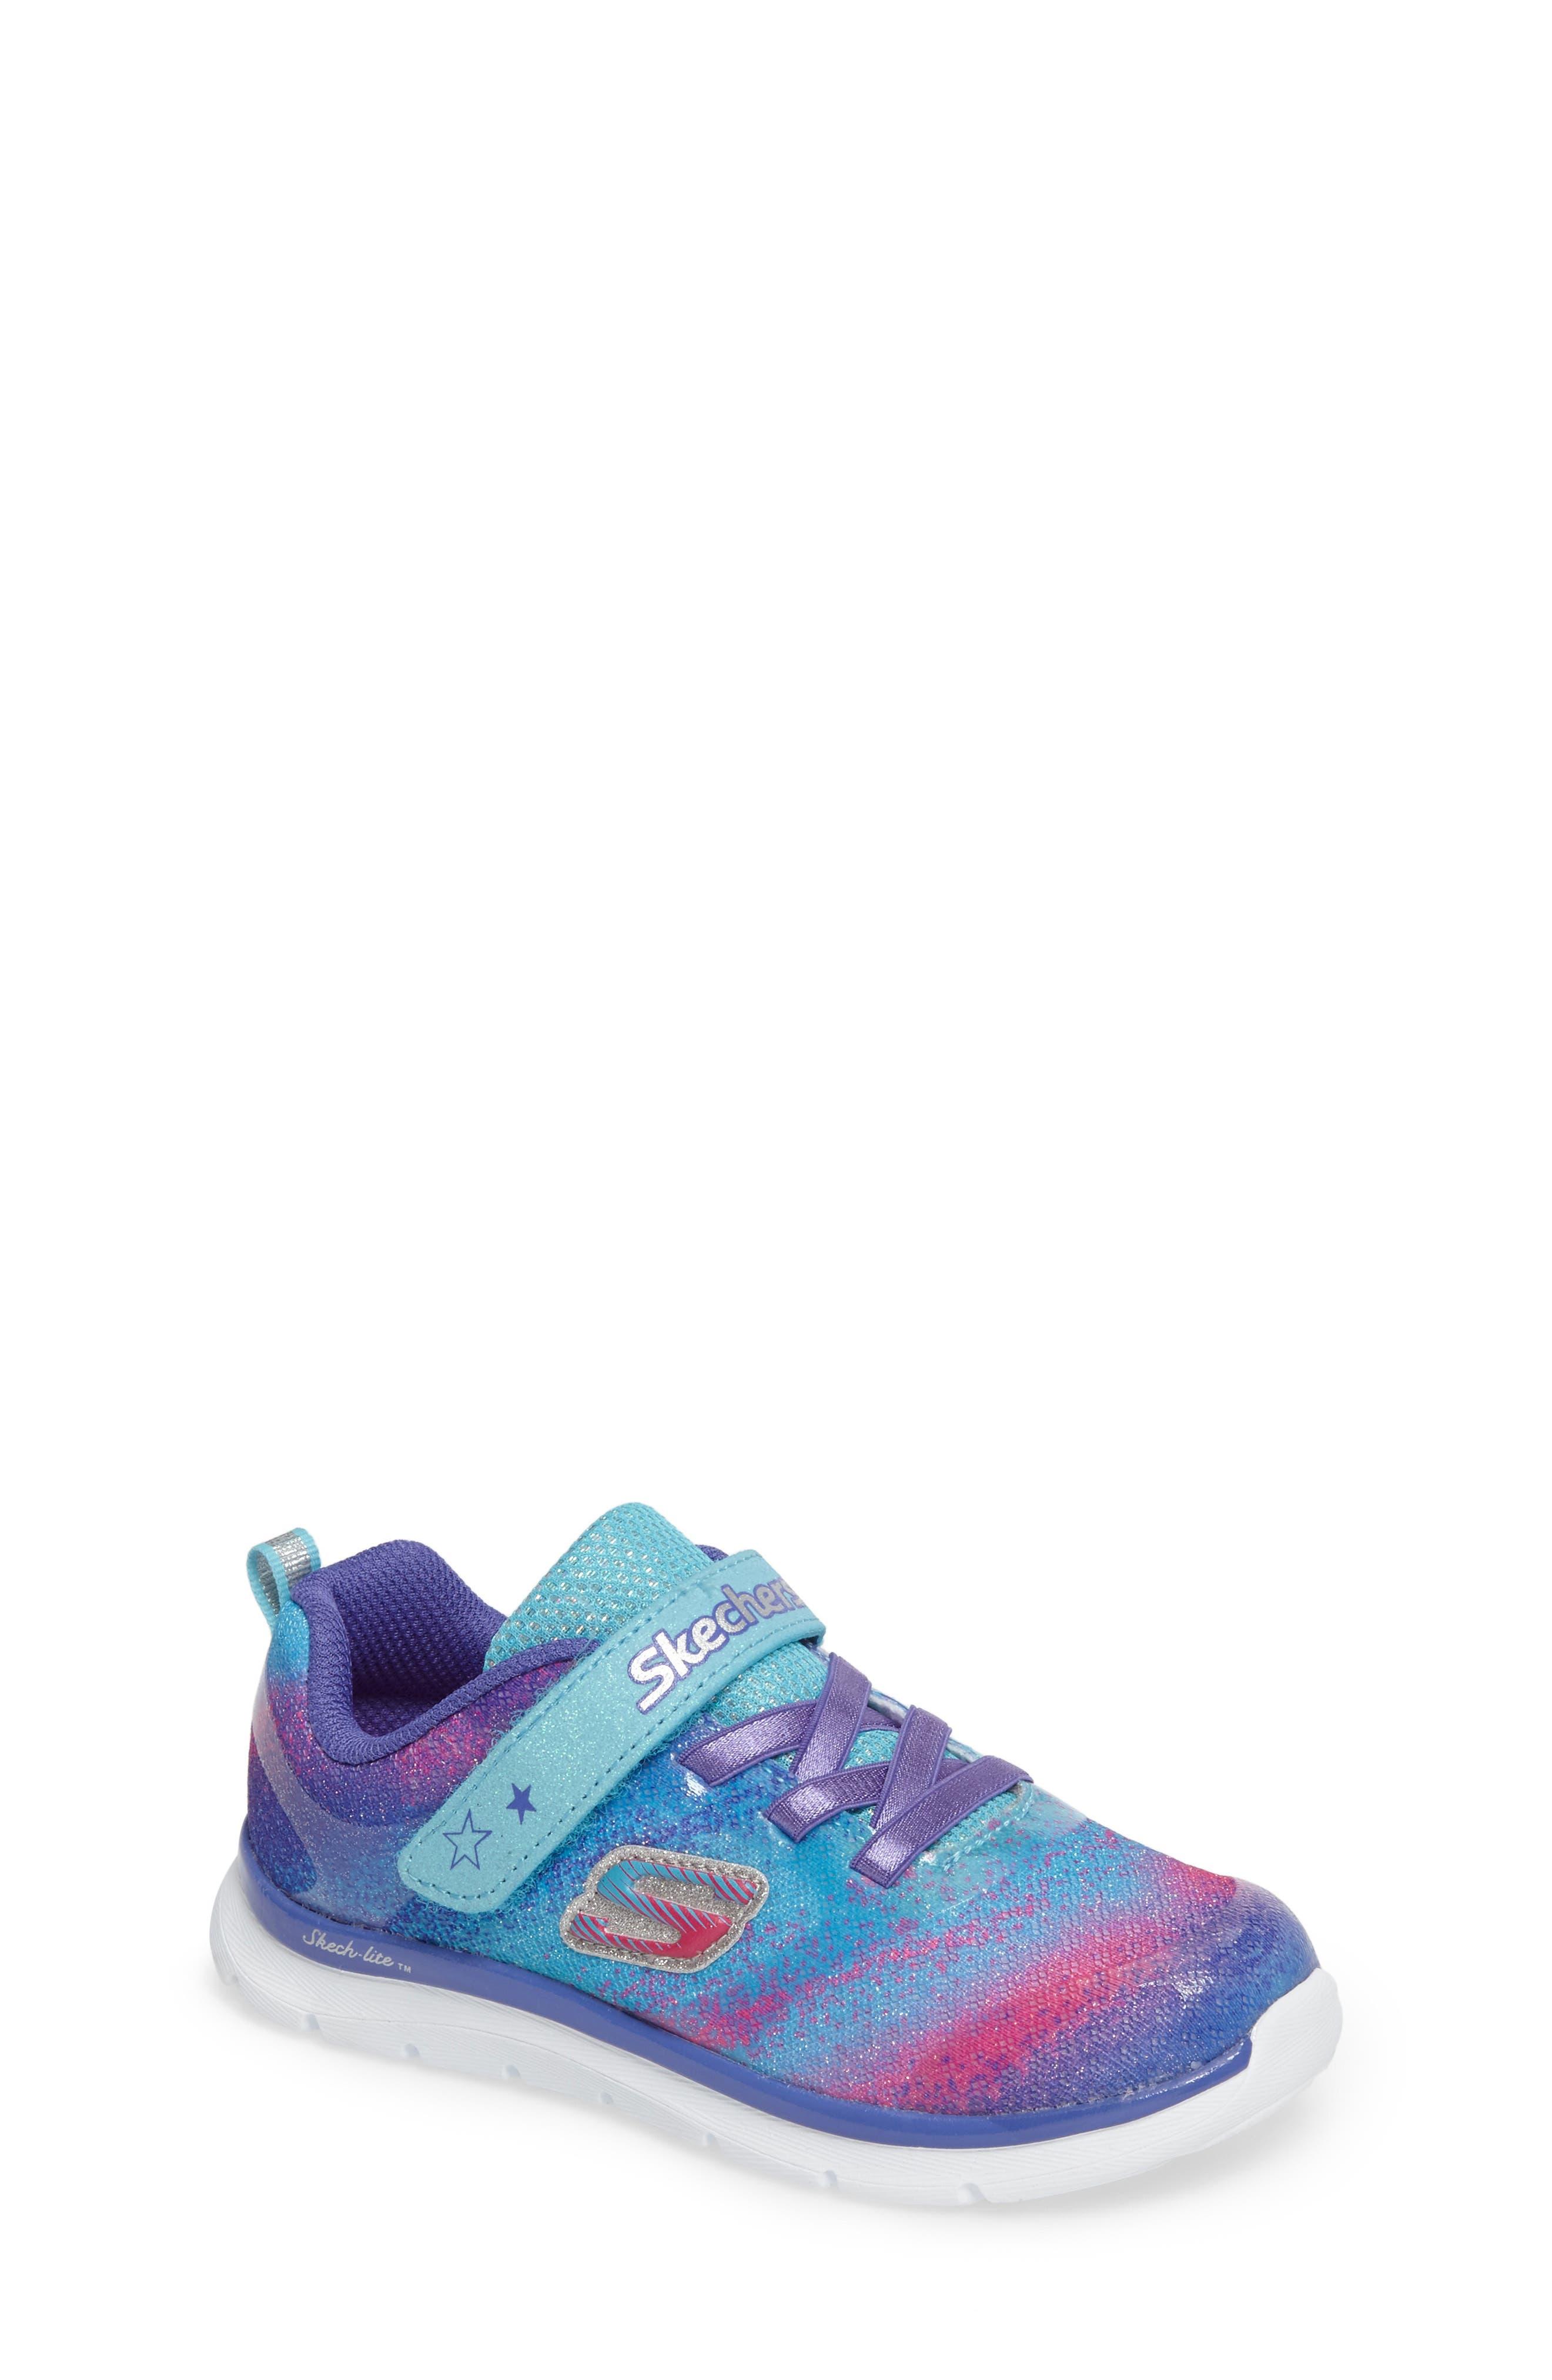 SKECHERS Skech-Lite Colorful Cutie Sneaker (Walker & Toddler)